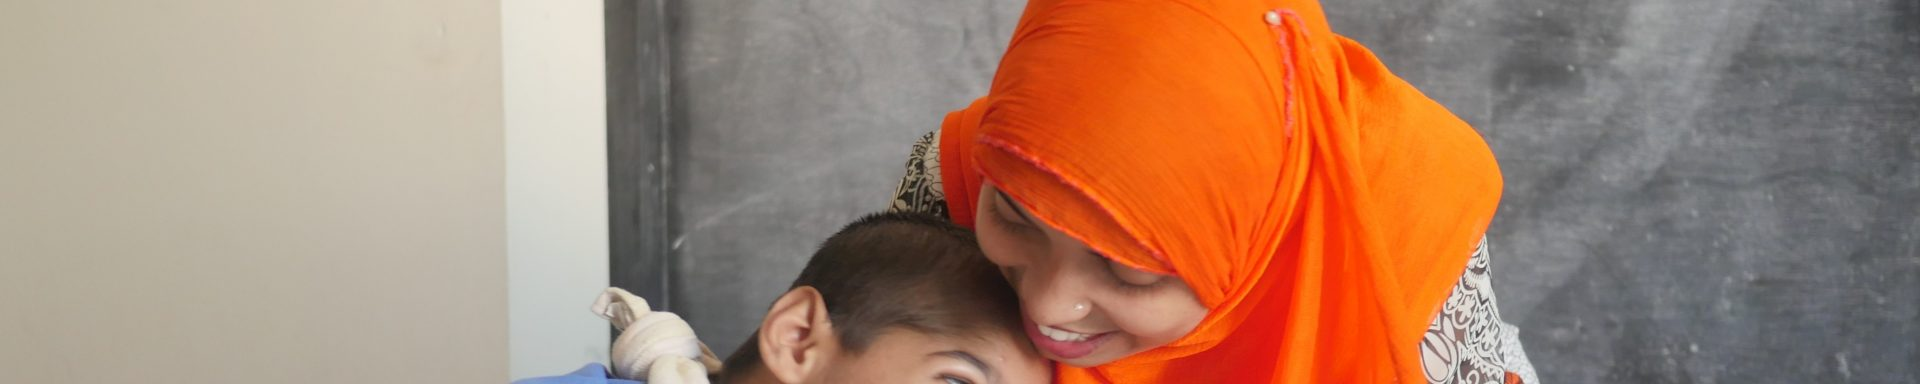 Vrouwen en kind uit Bangladesh lachen samen.